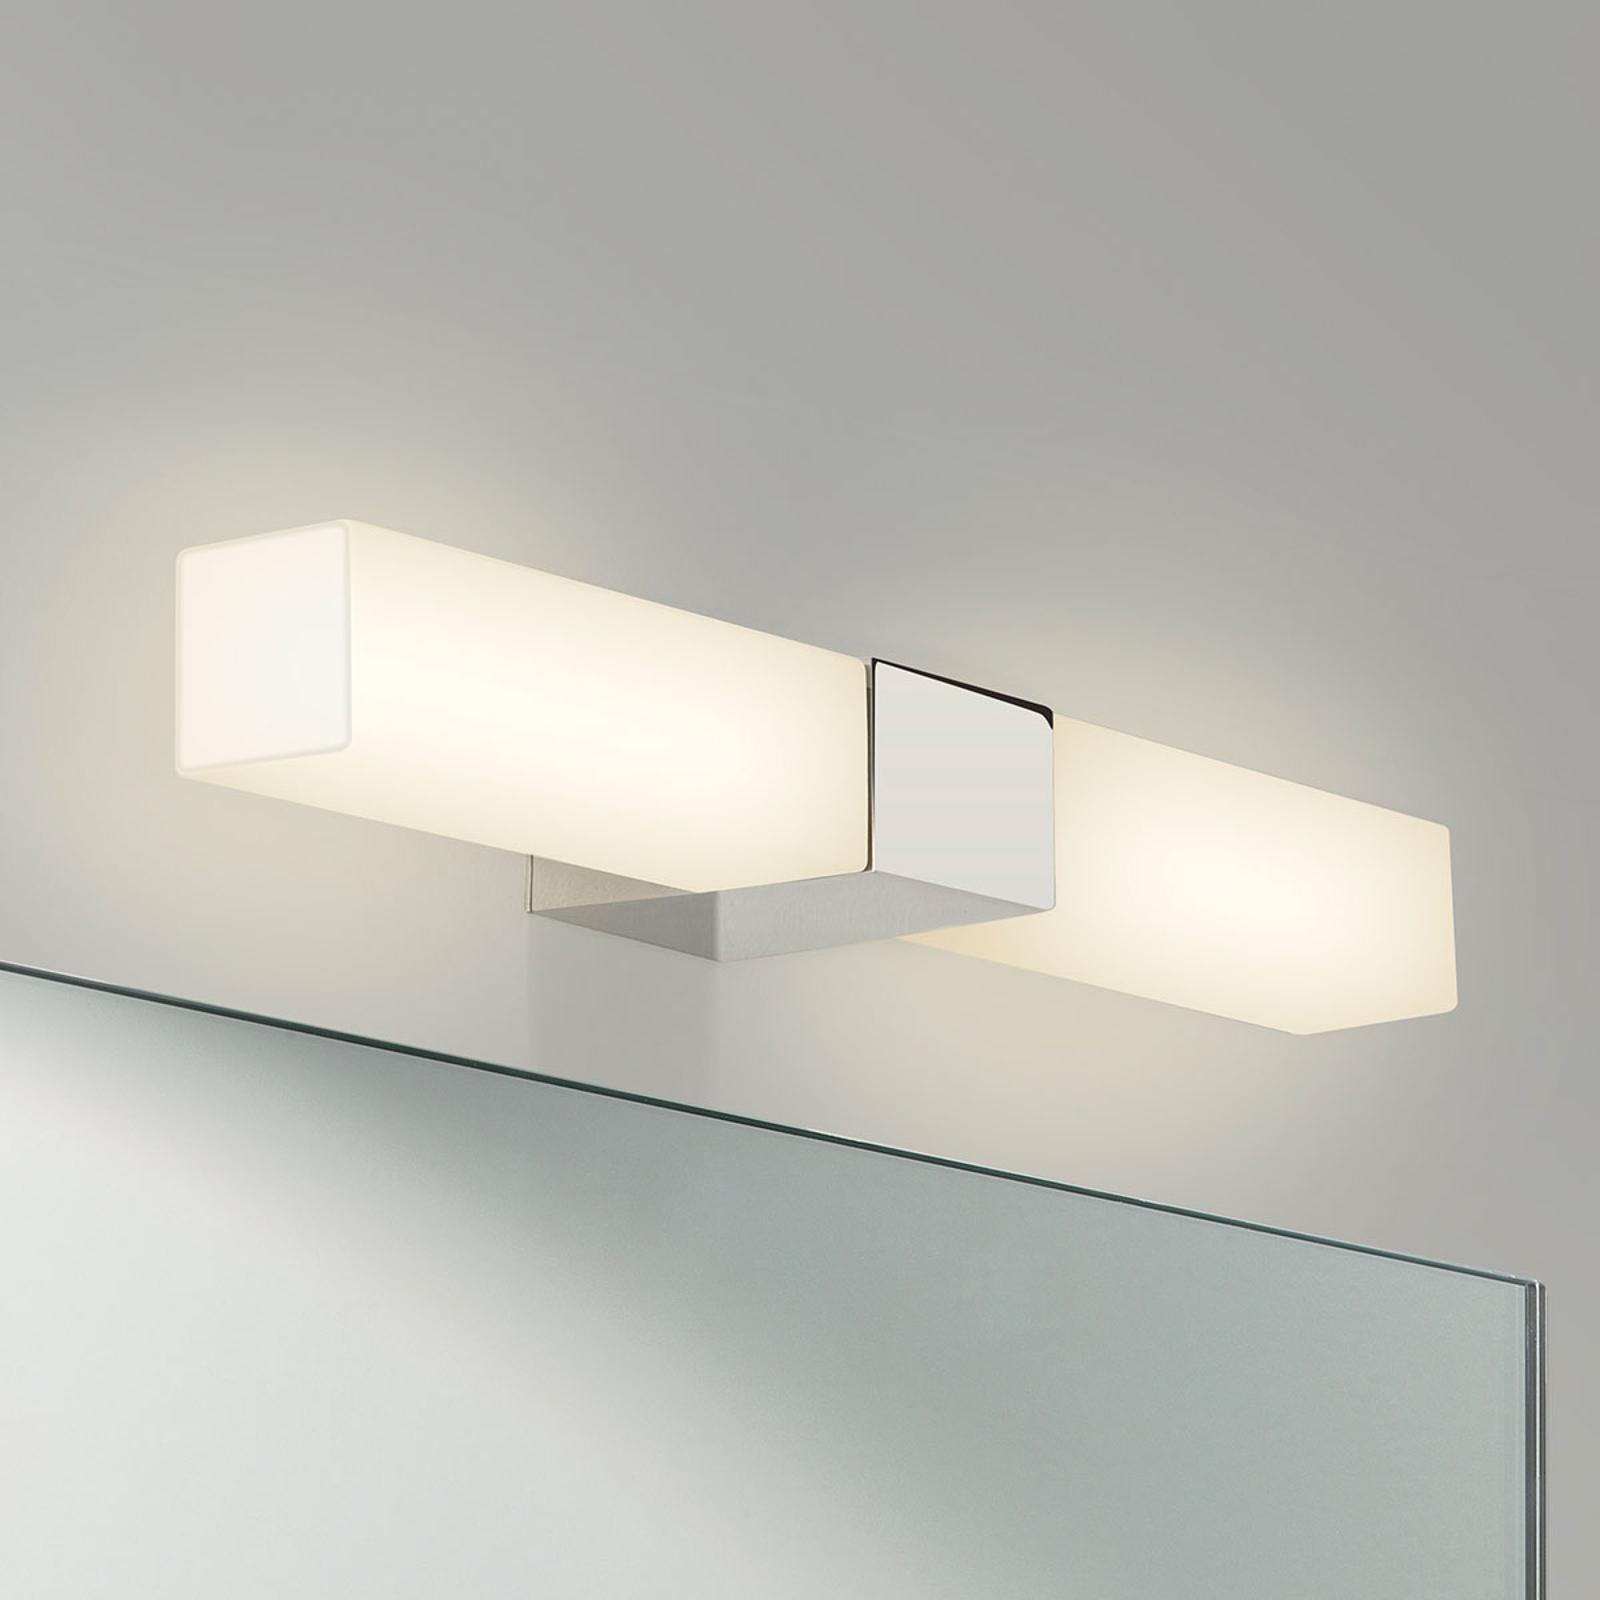 Astro Padova Square wall light für the bathroom_1020387_1